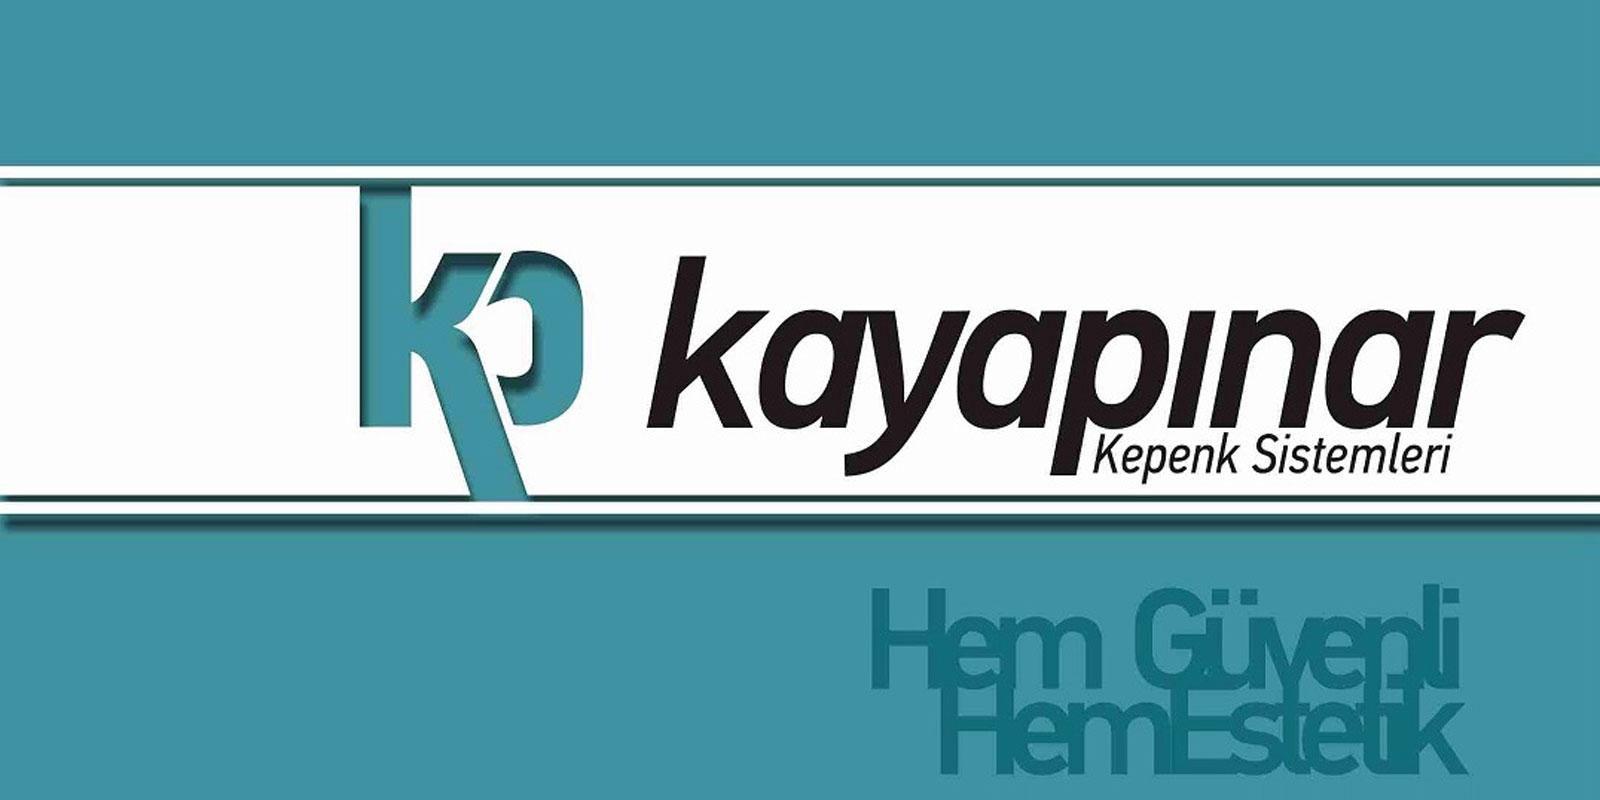 http://kayapinarkepenk.com/image/cache/catalog/slider/s1-1600x800.jpg